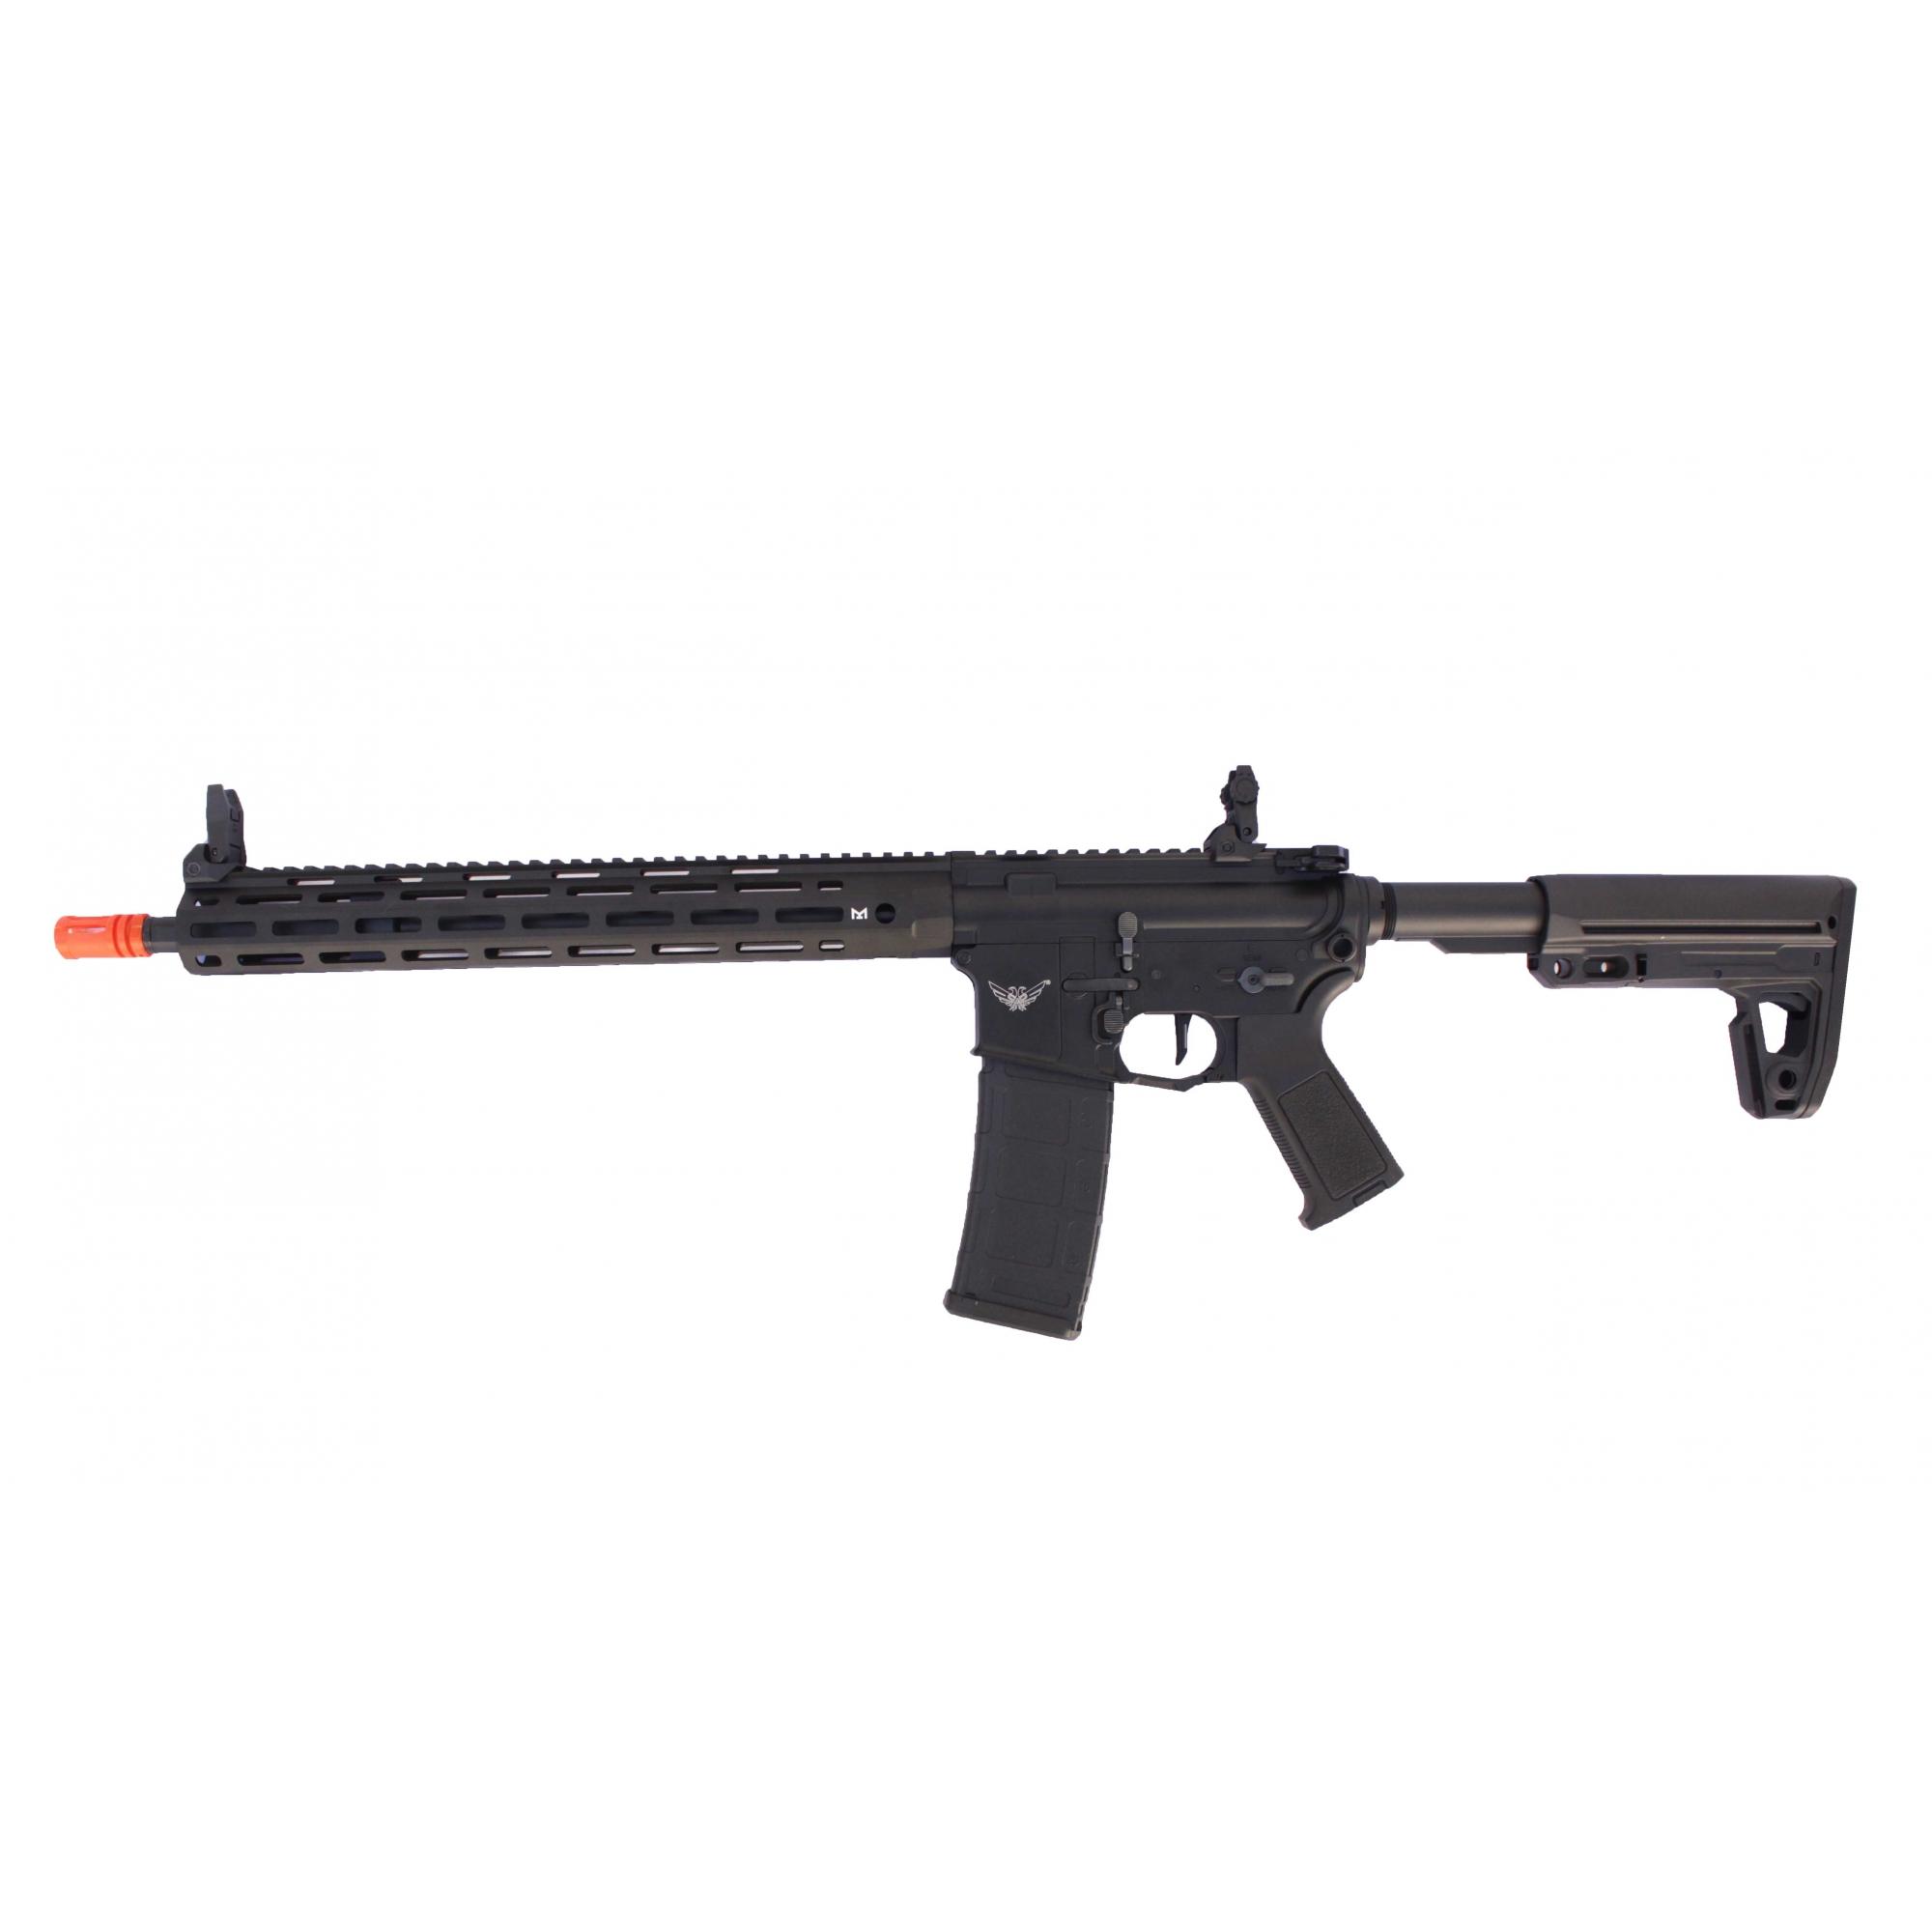 Rifle airsoft M4 D.E. Armory Rynx M906A